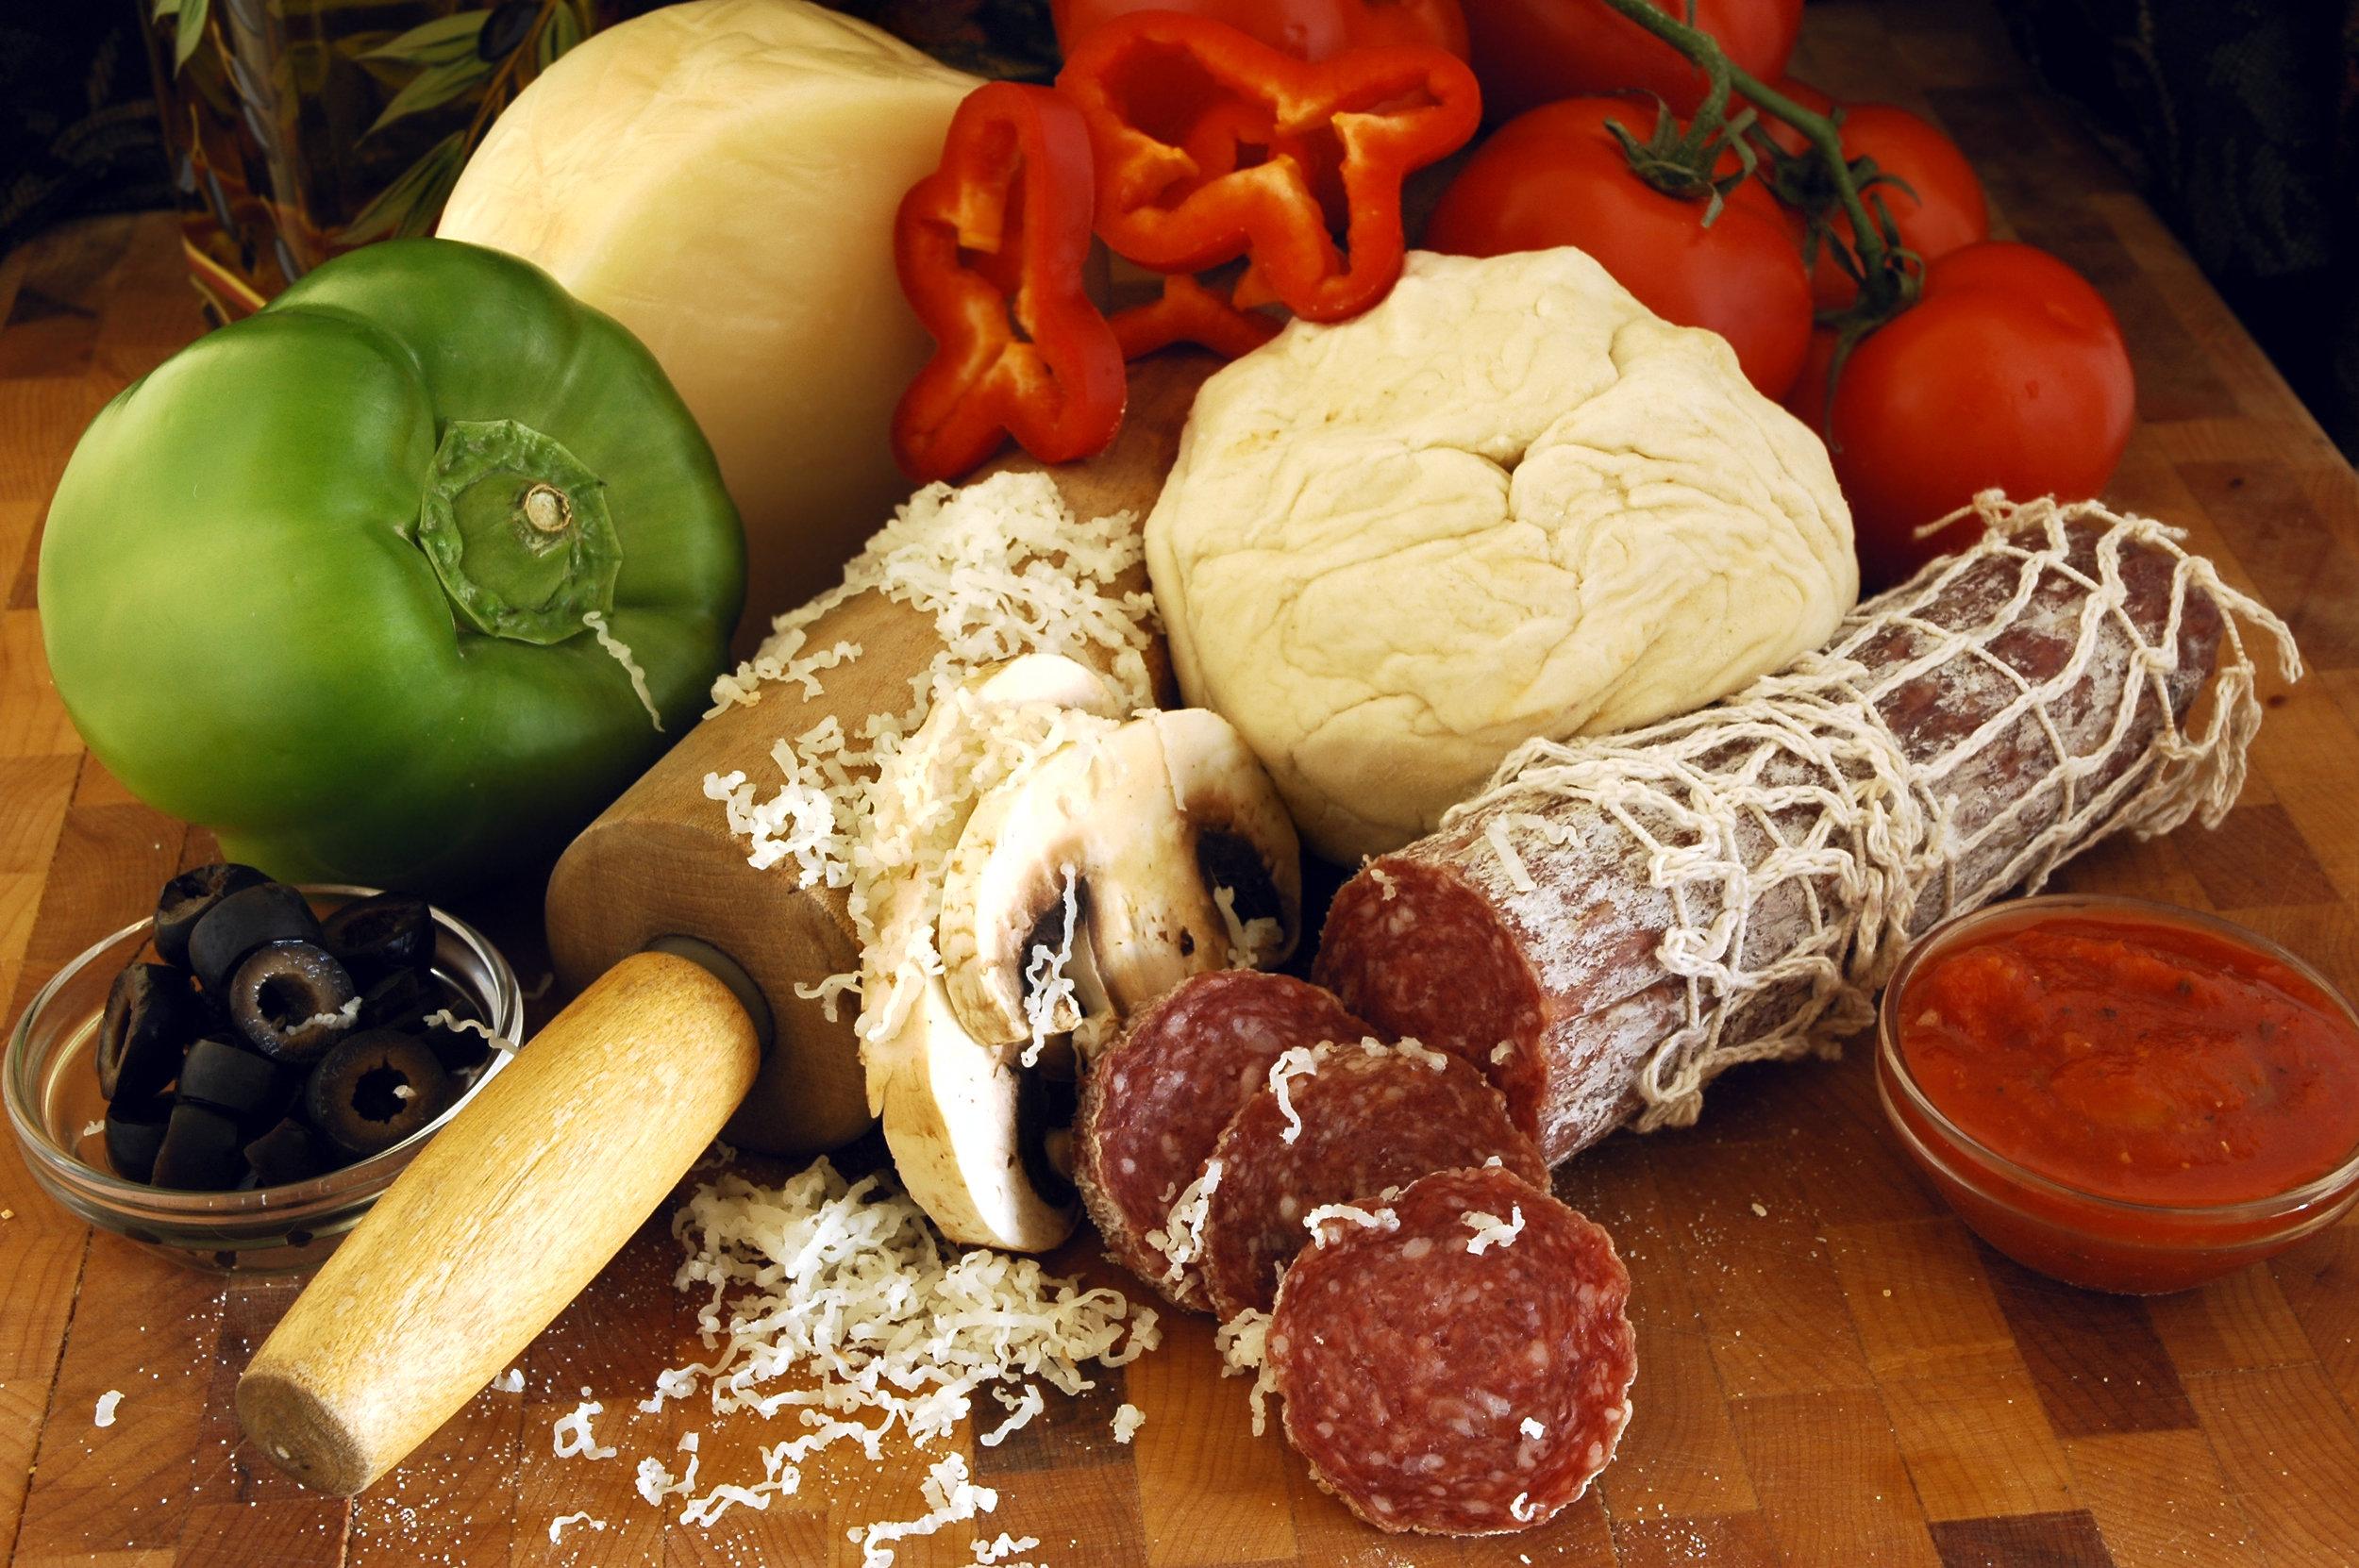 bigstock-Pizza-Ingredients-1233119.jpg